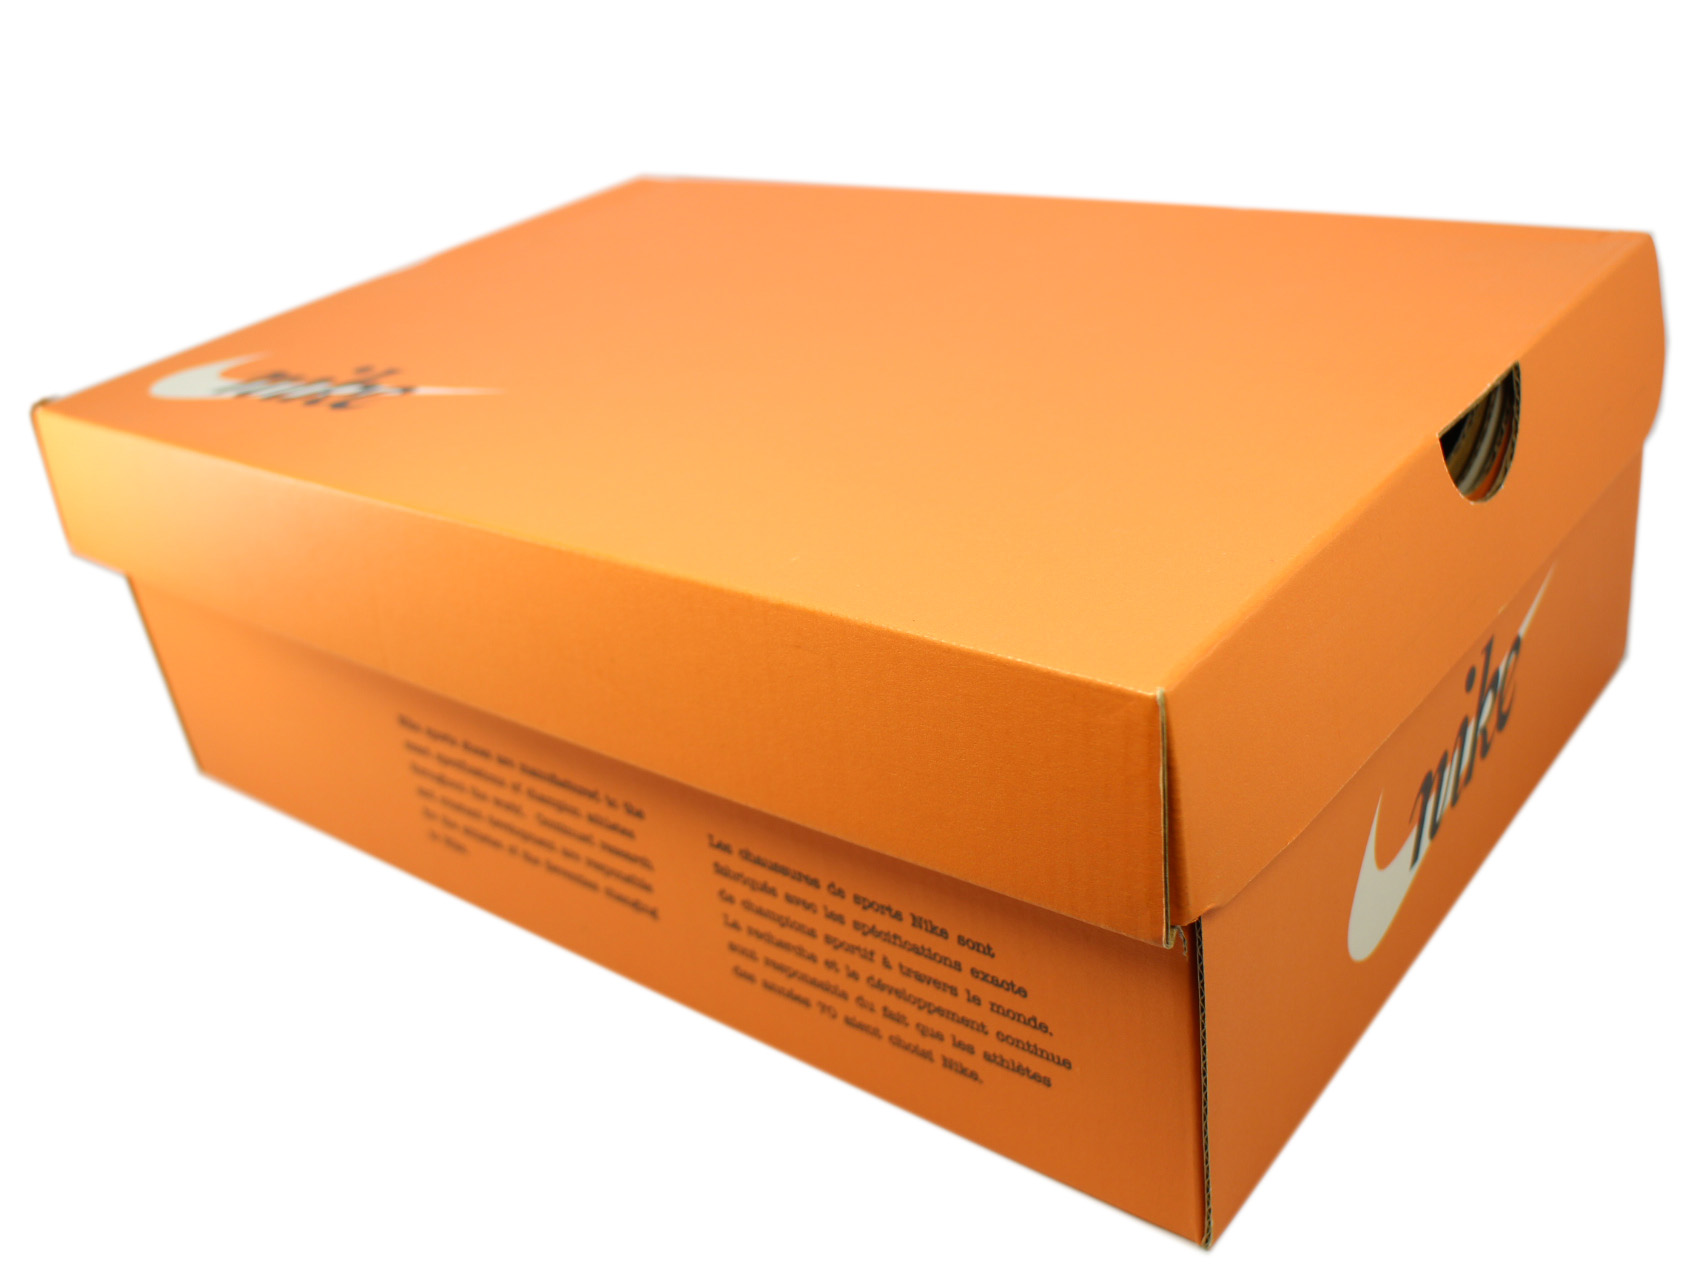 DUNK HIGH QK (VNTG)の商品画像-7